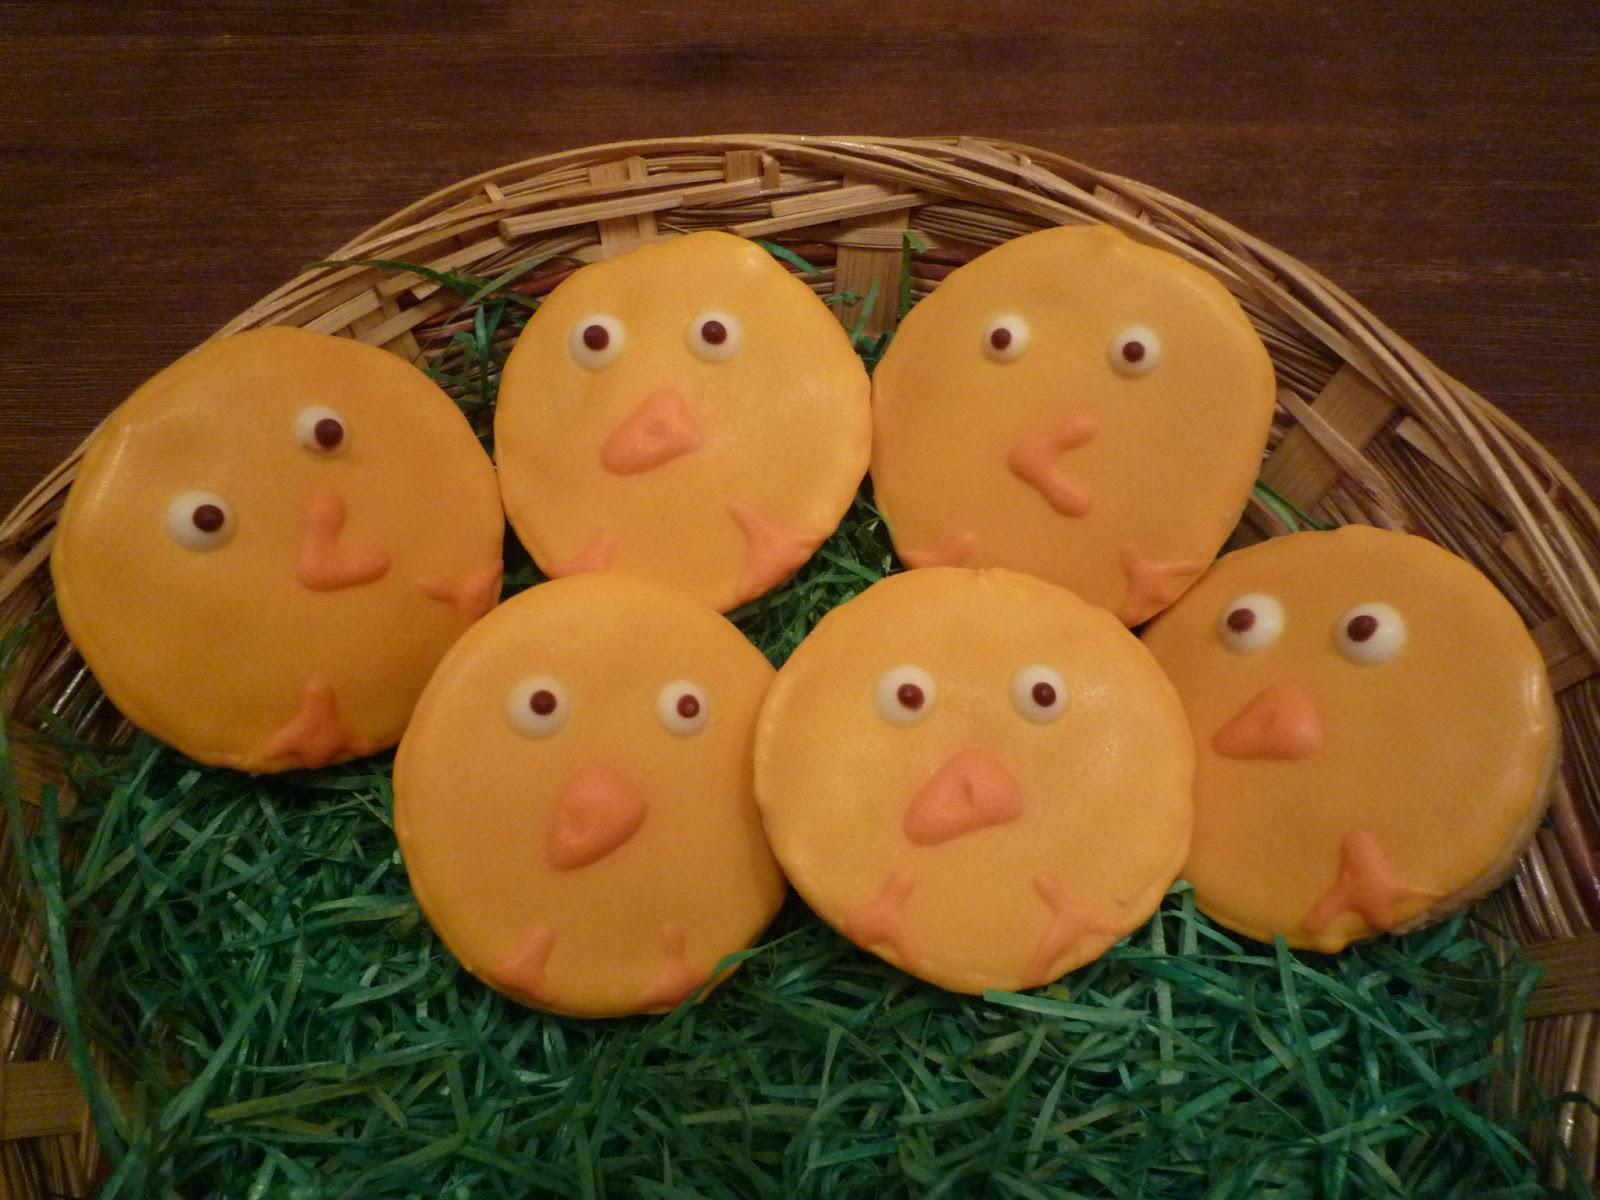 Kekse, Küken-Kekse, Kükenkekse, Ostern, Royal Icing